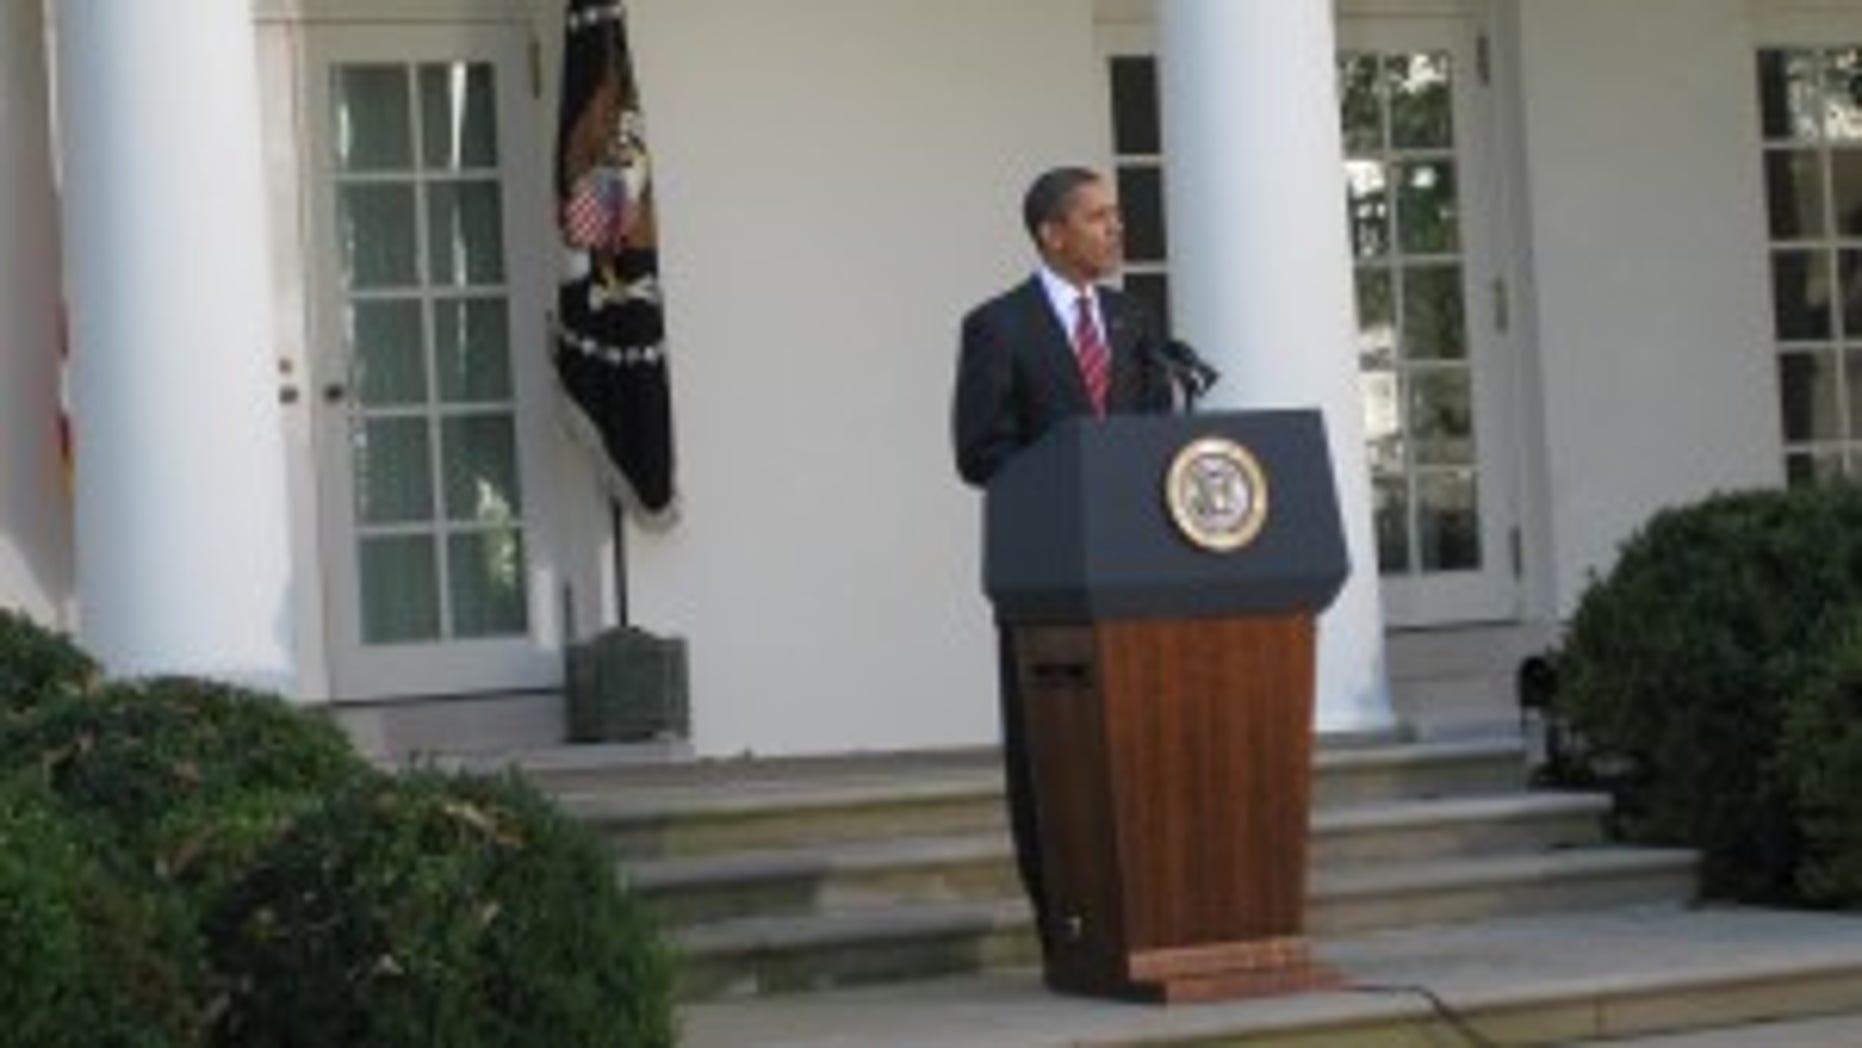 President Obama speaking in the Rose Garden (Photo by Eve Zibel)